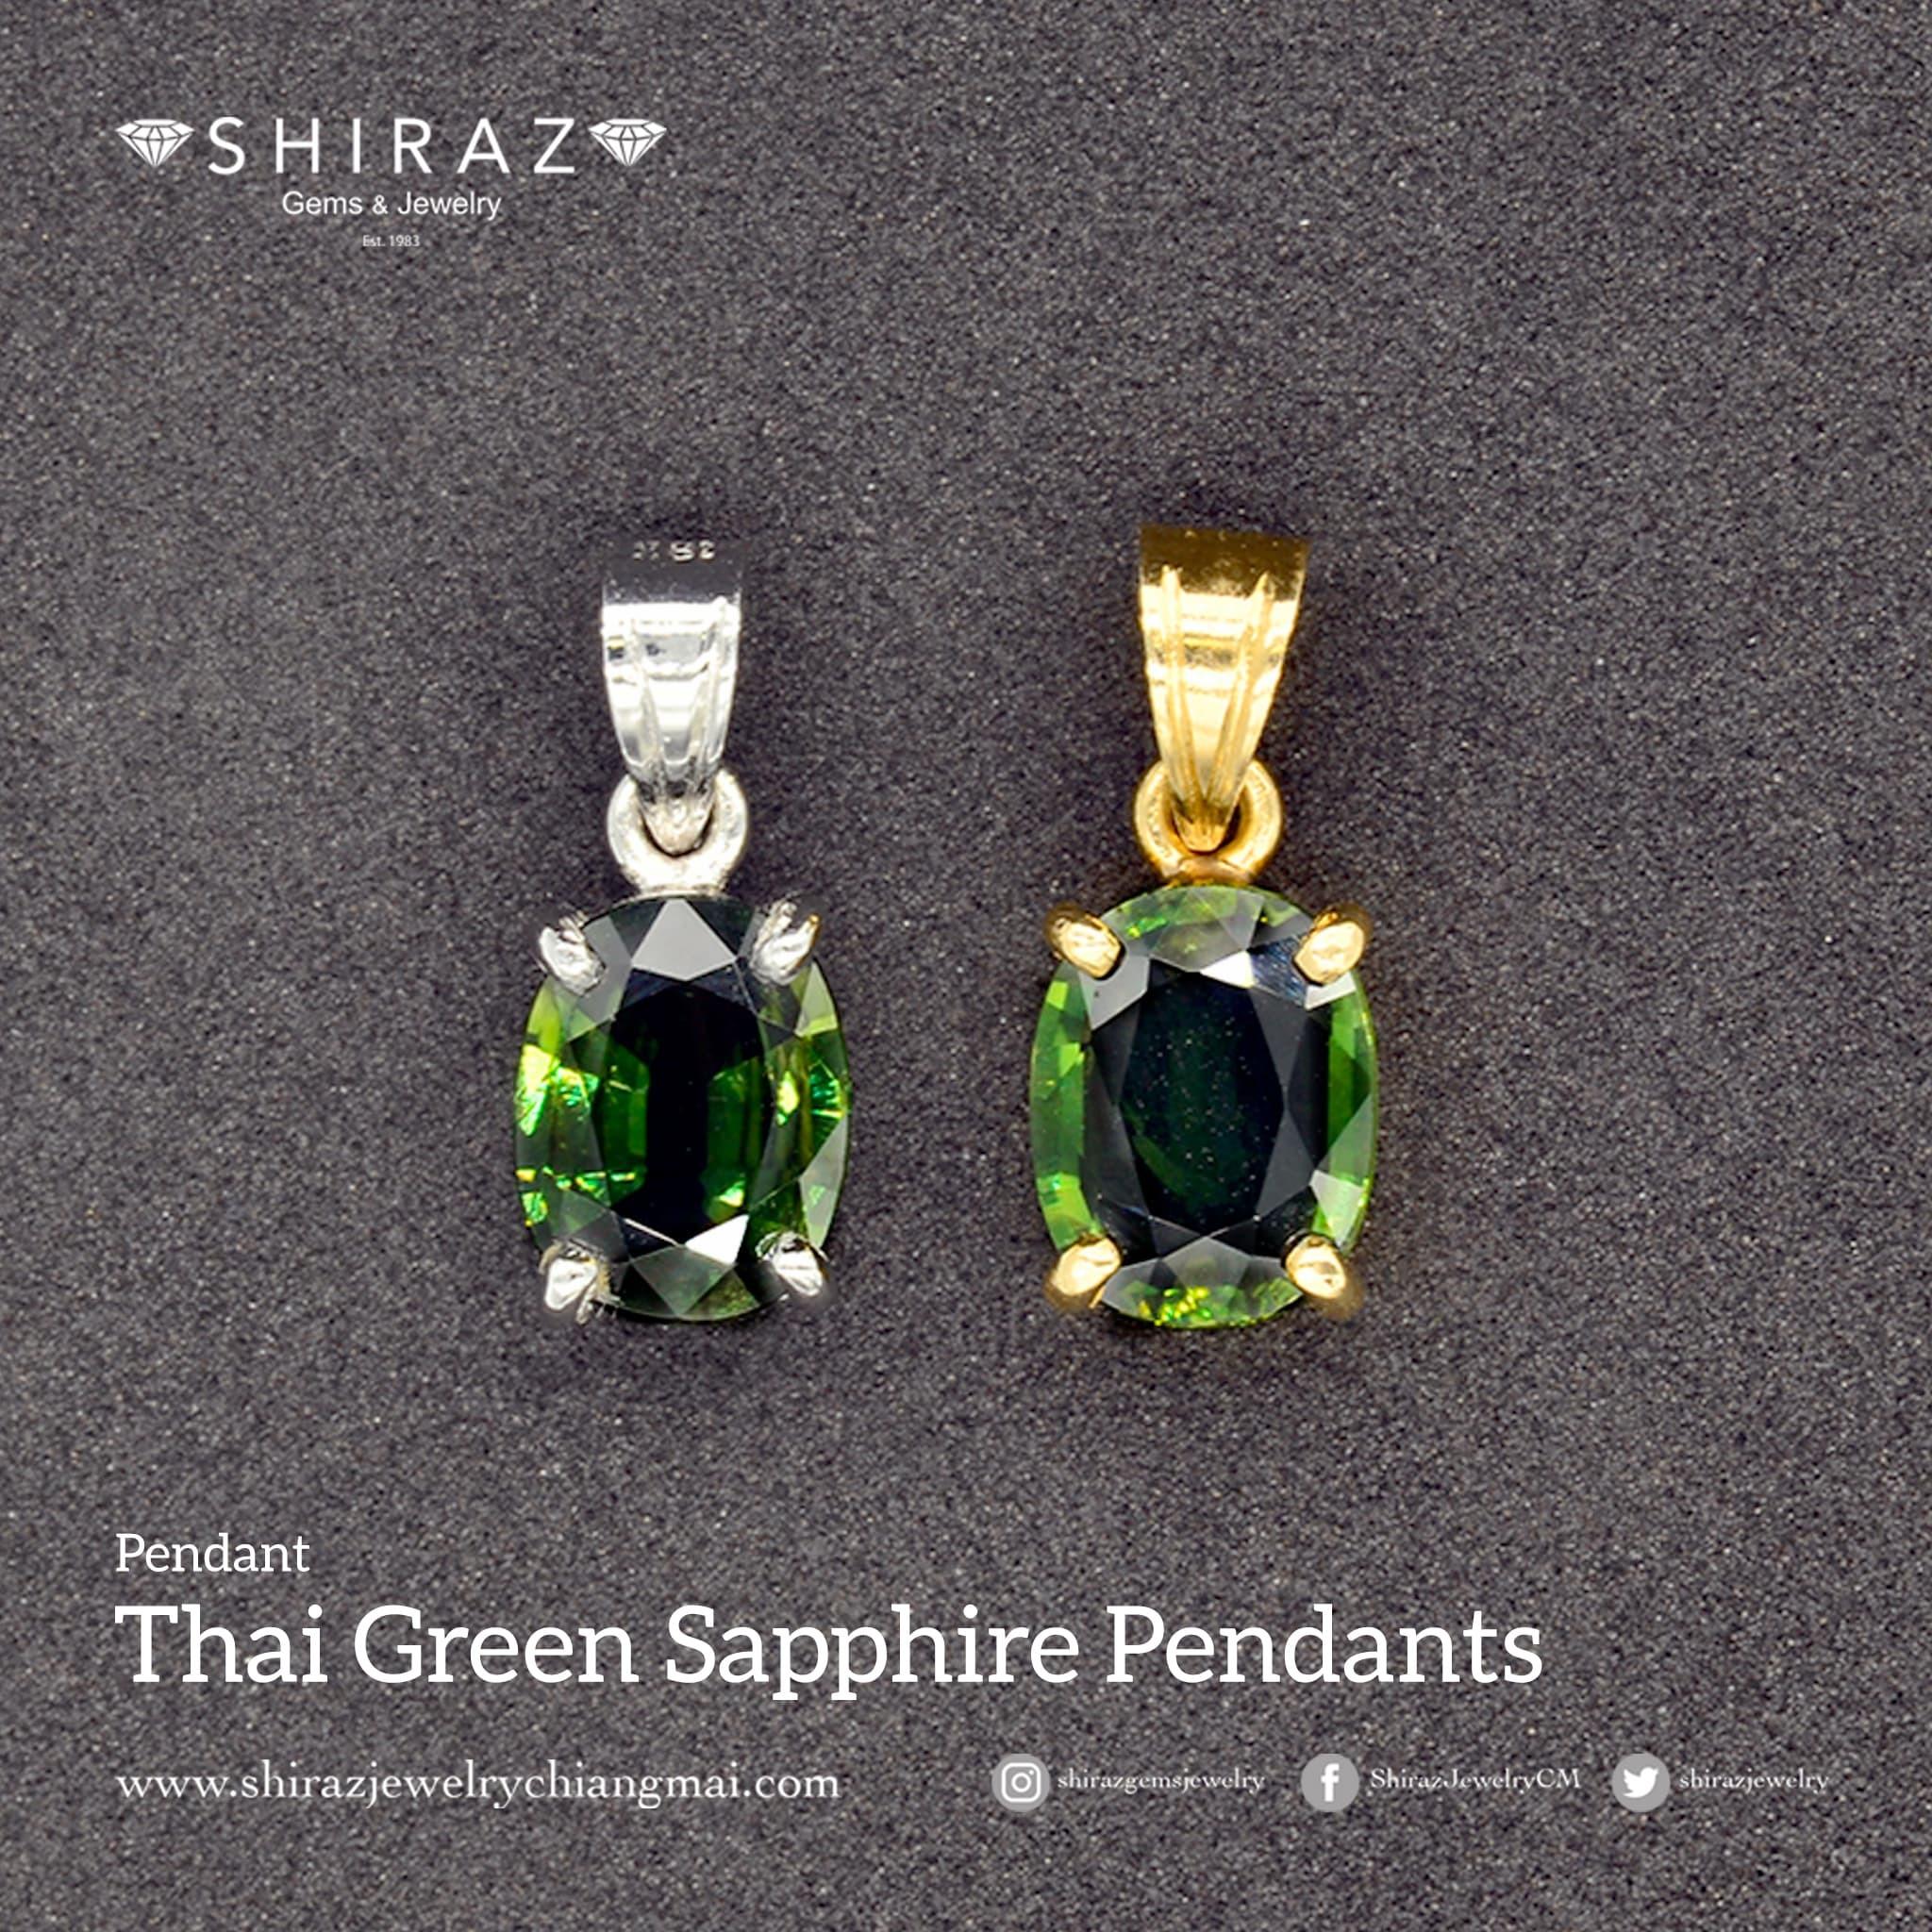 Pendant with Thai green sapphire